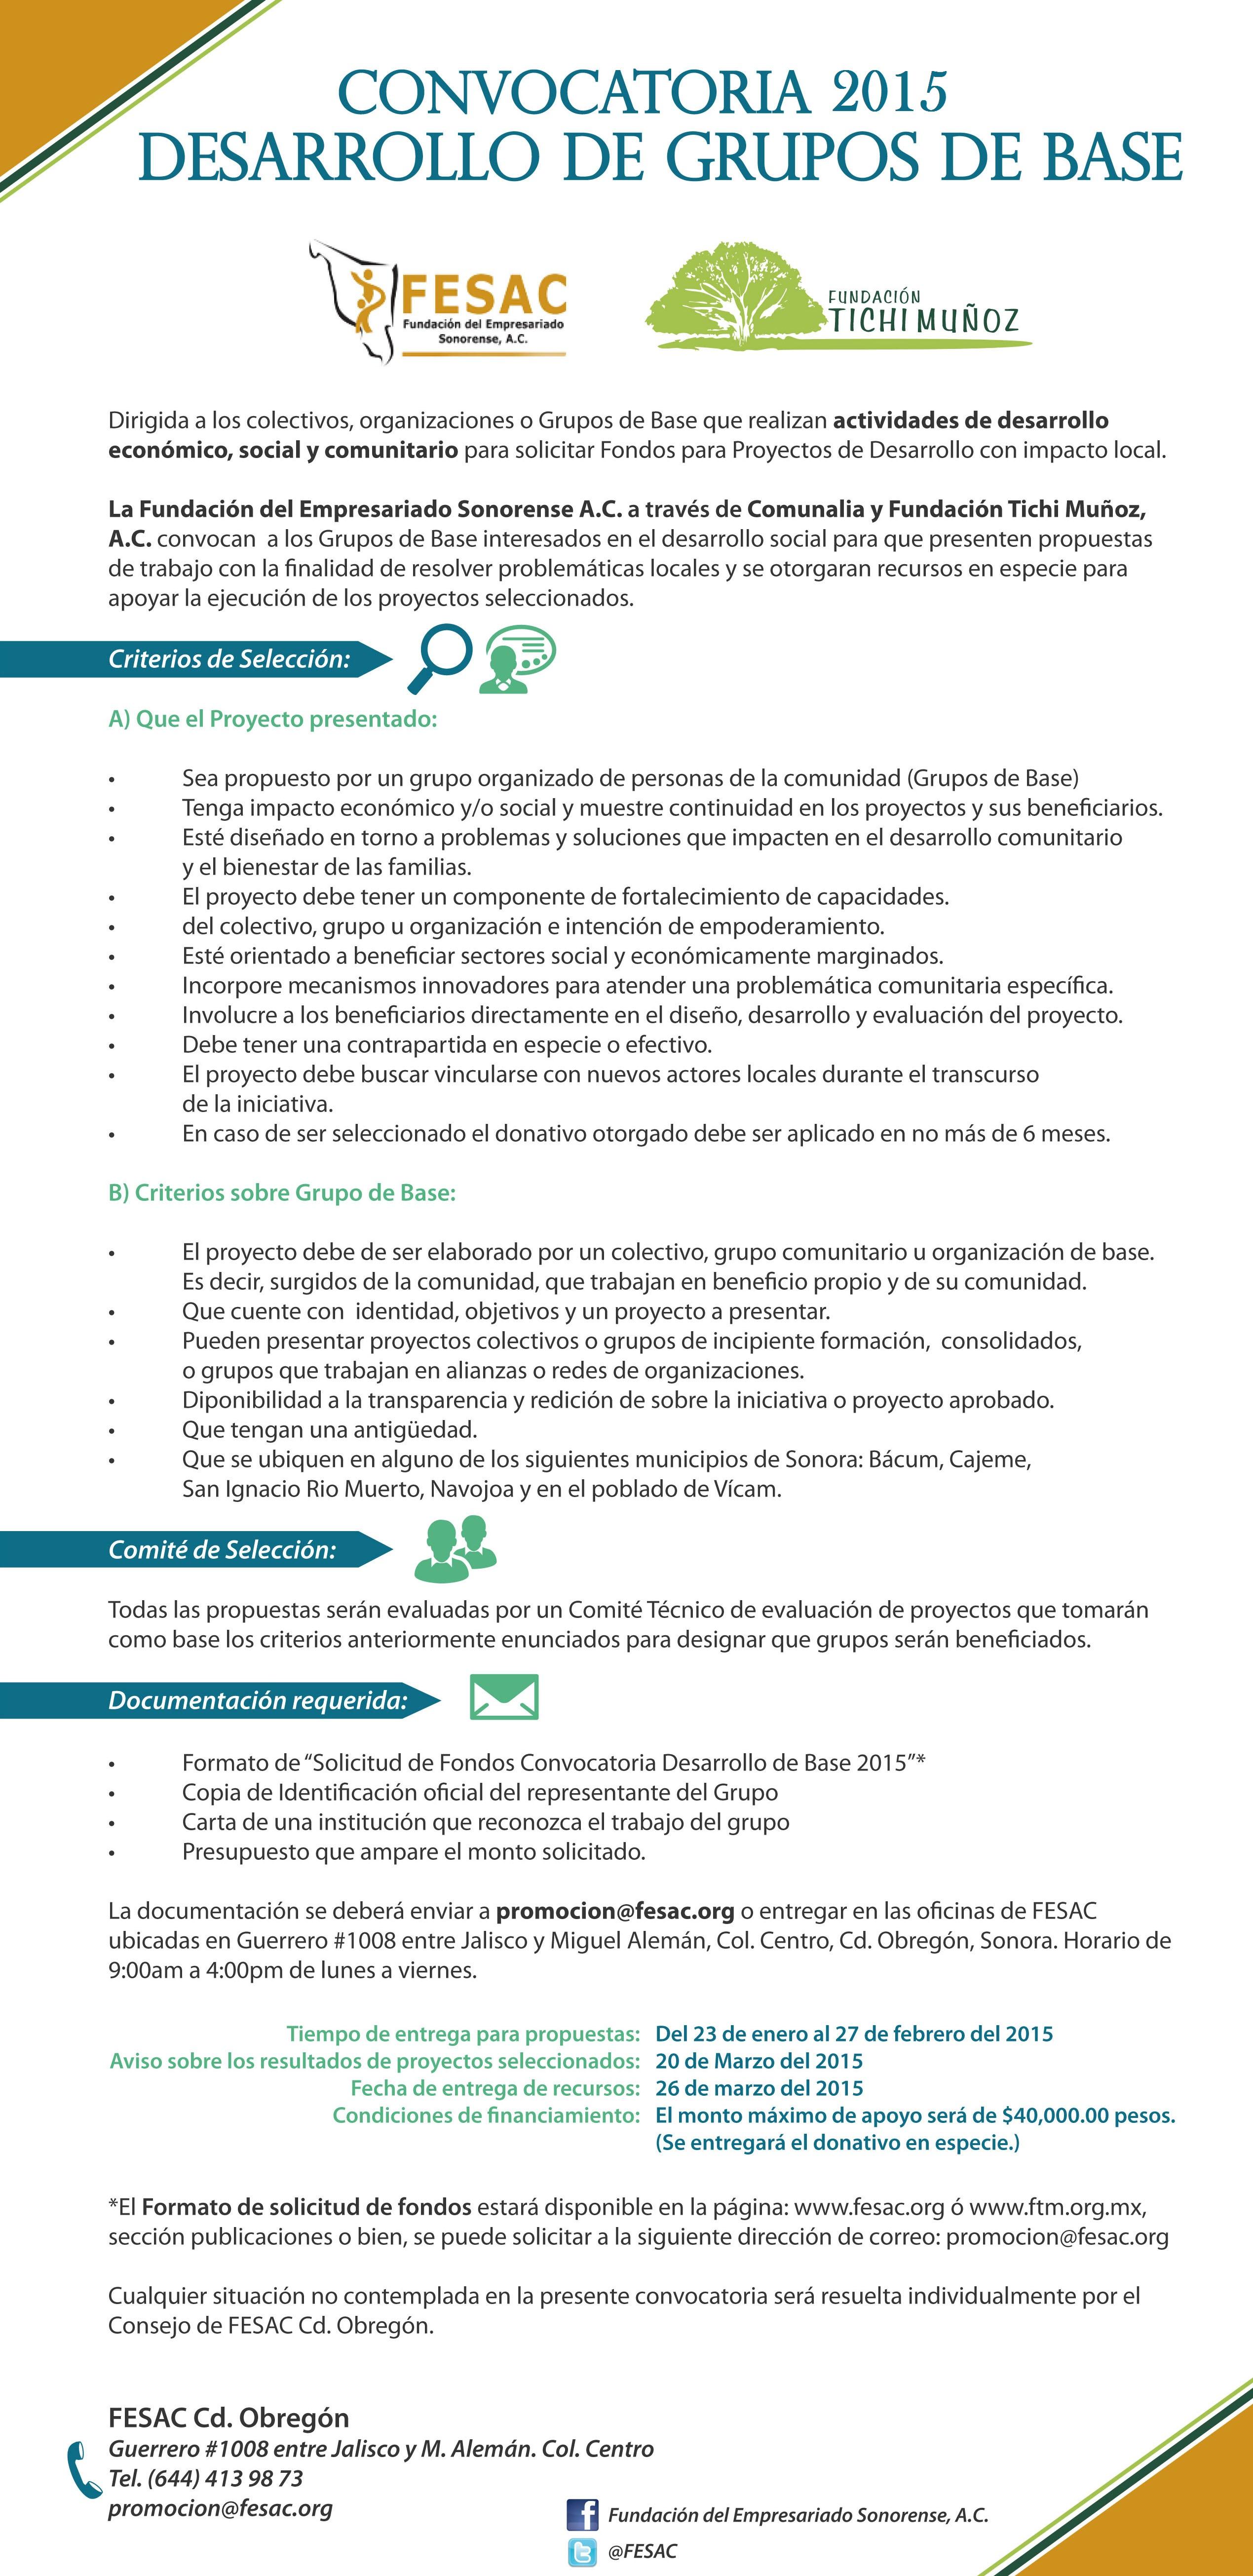 diseño convocatoria fesac-ftm - 2da publicacion